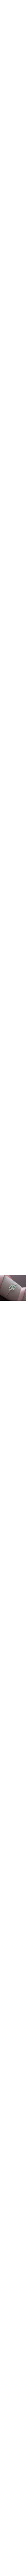 """Shema Yisrael"" silver pendant"